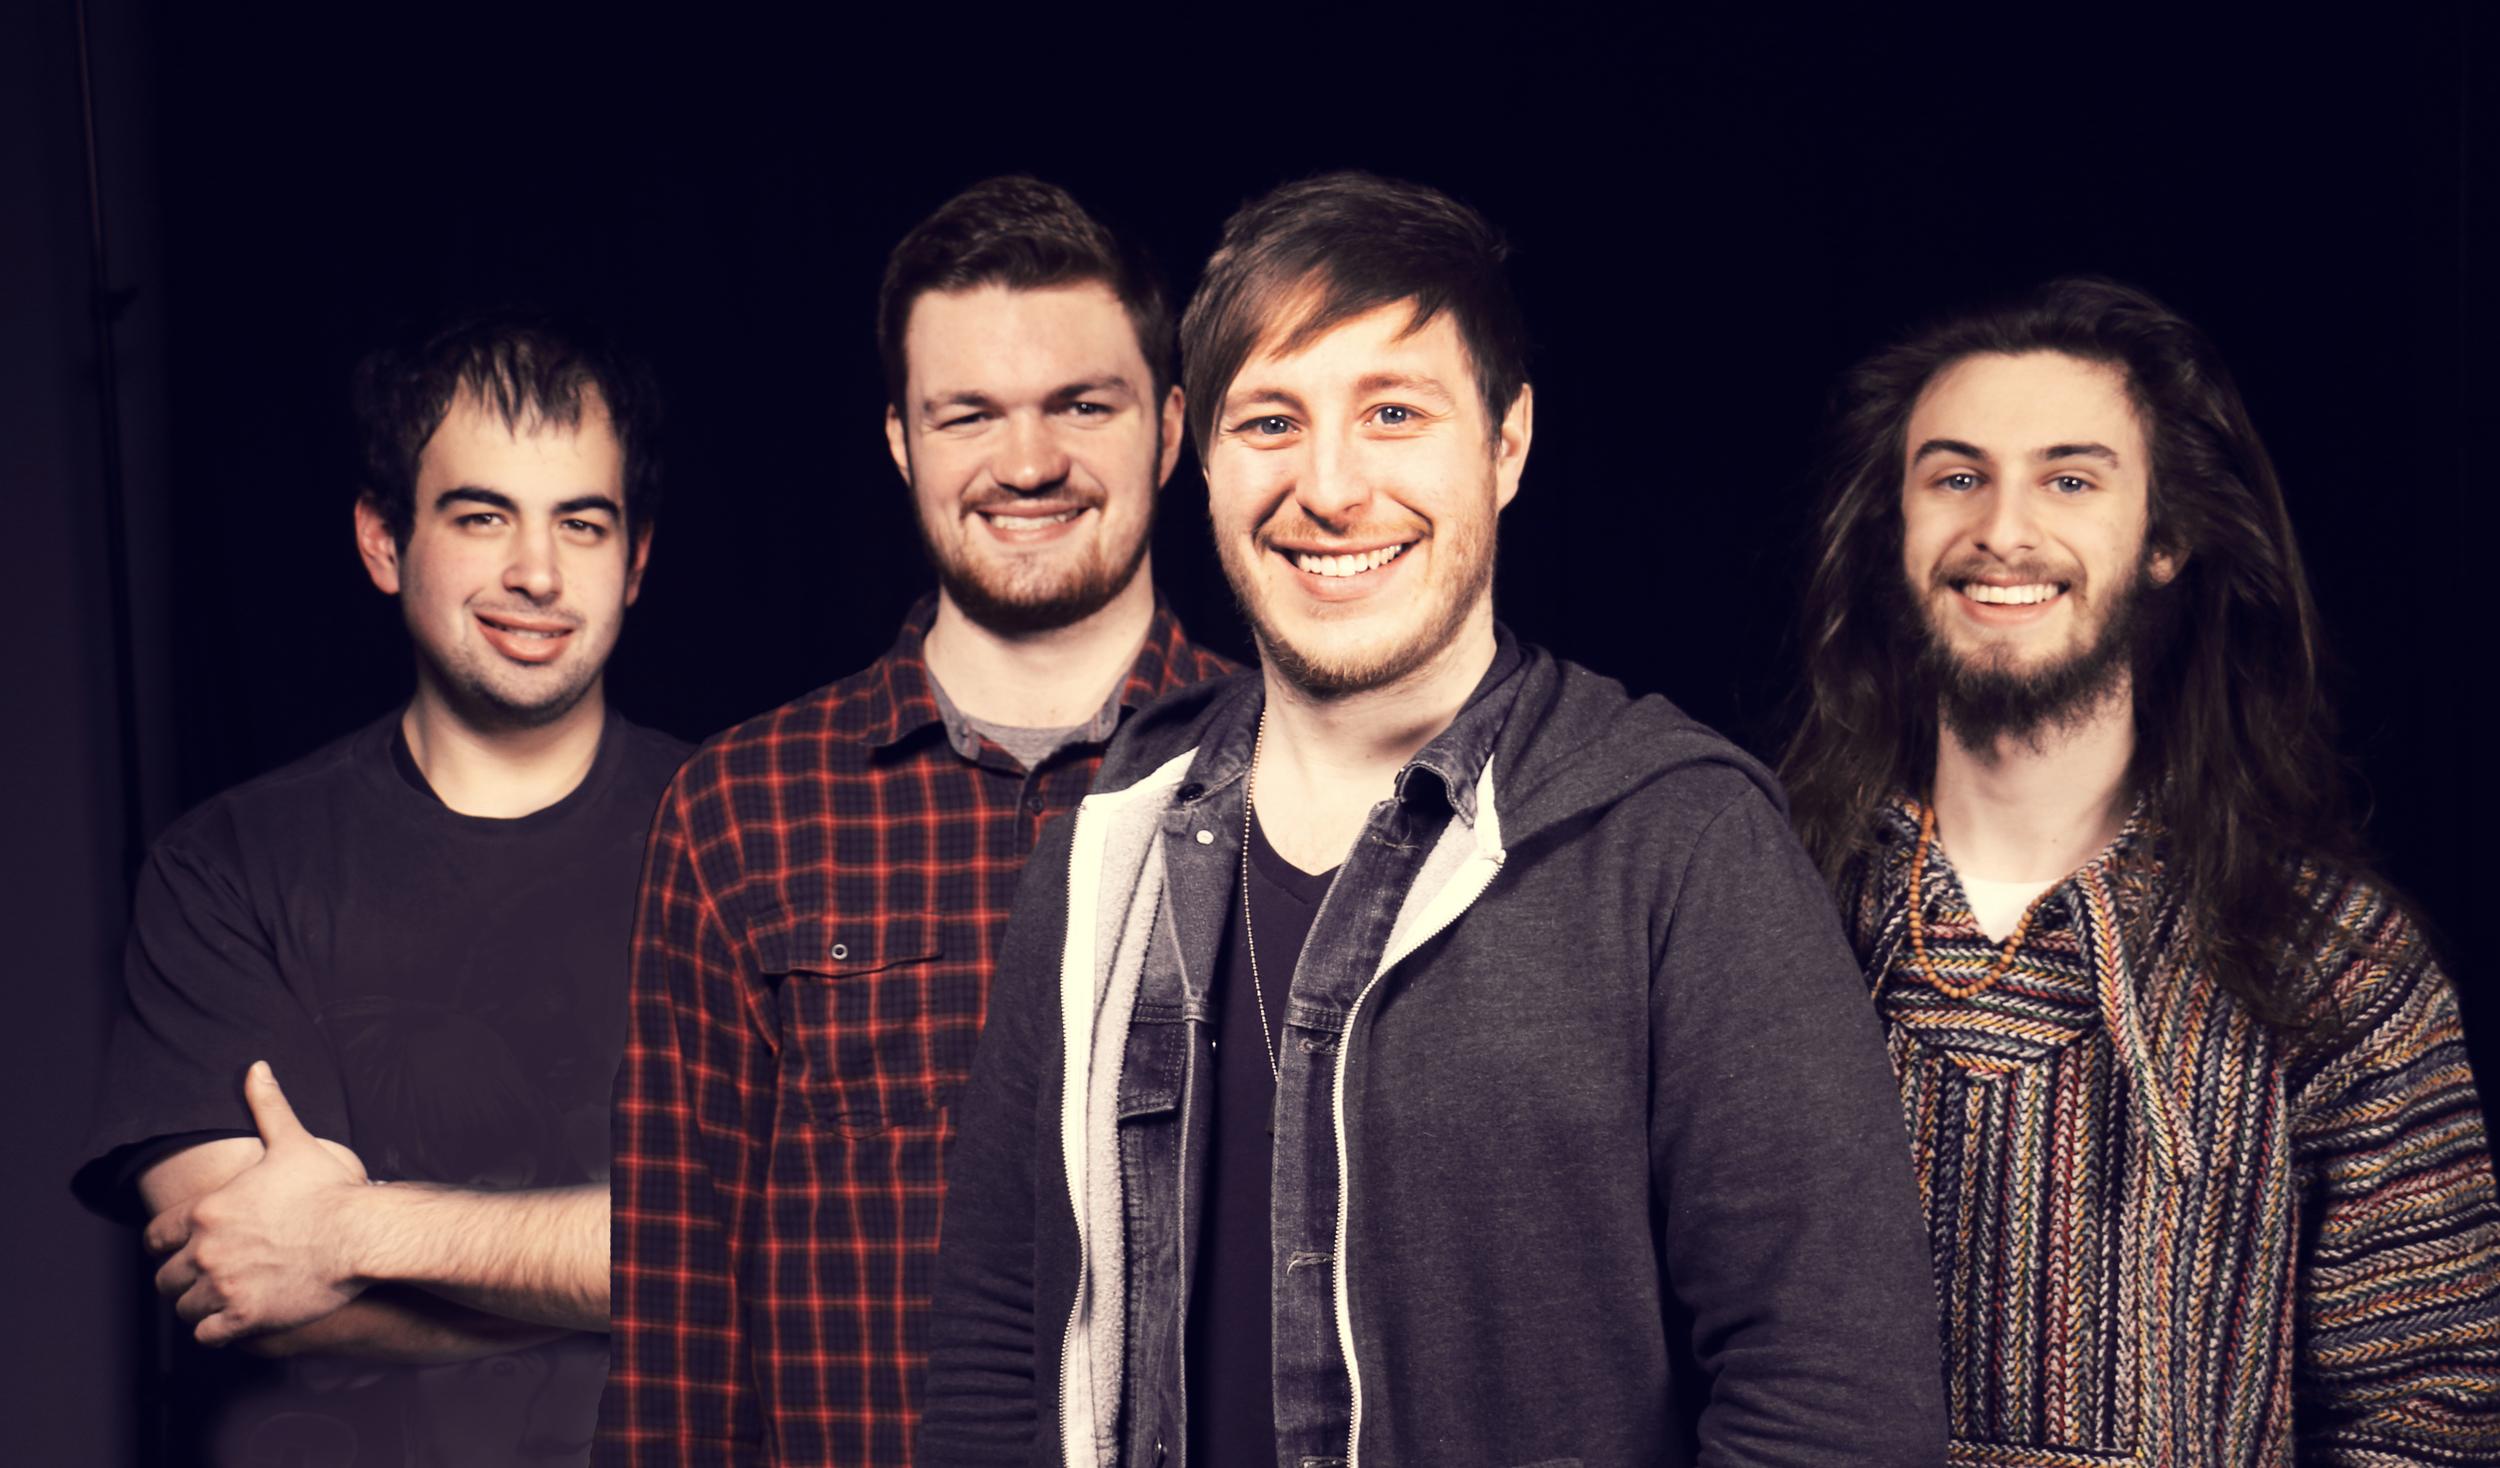 The Scenic Sound - Tour lineup for Spring 2015 (Dan, Stuart, Tim, Kevin)